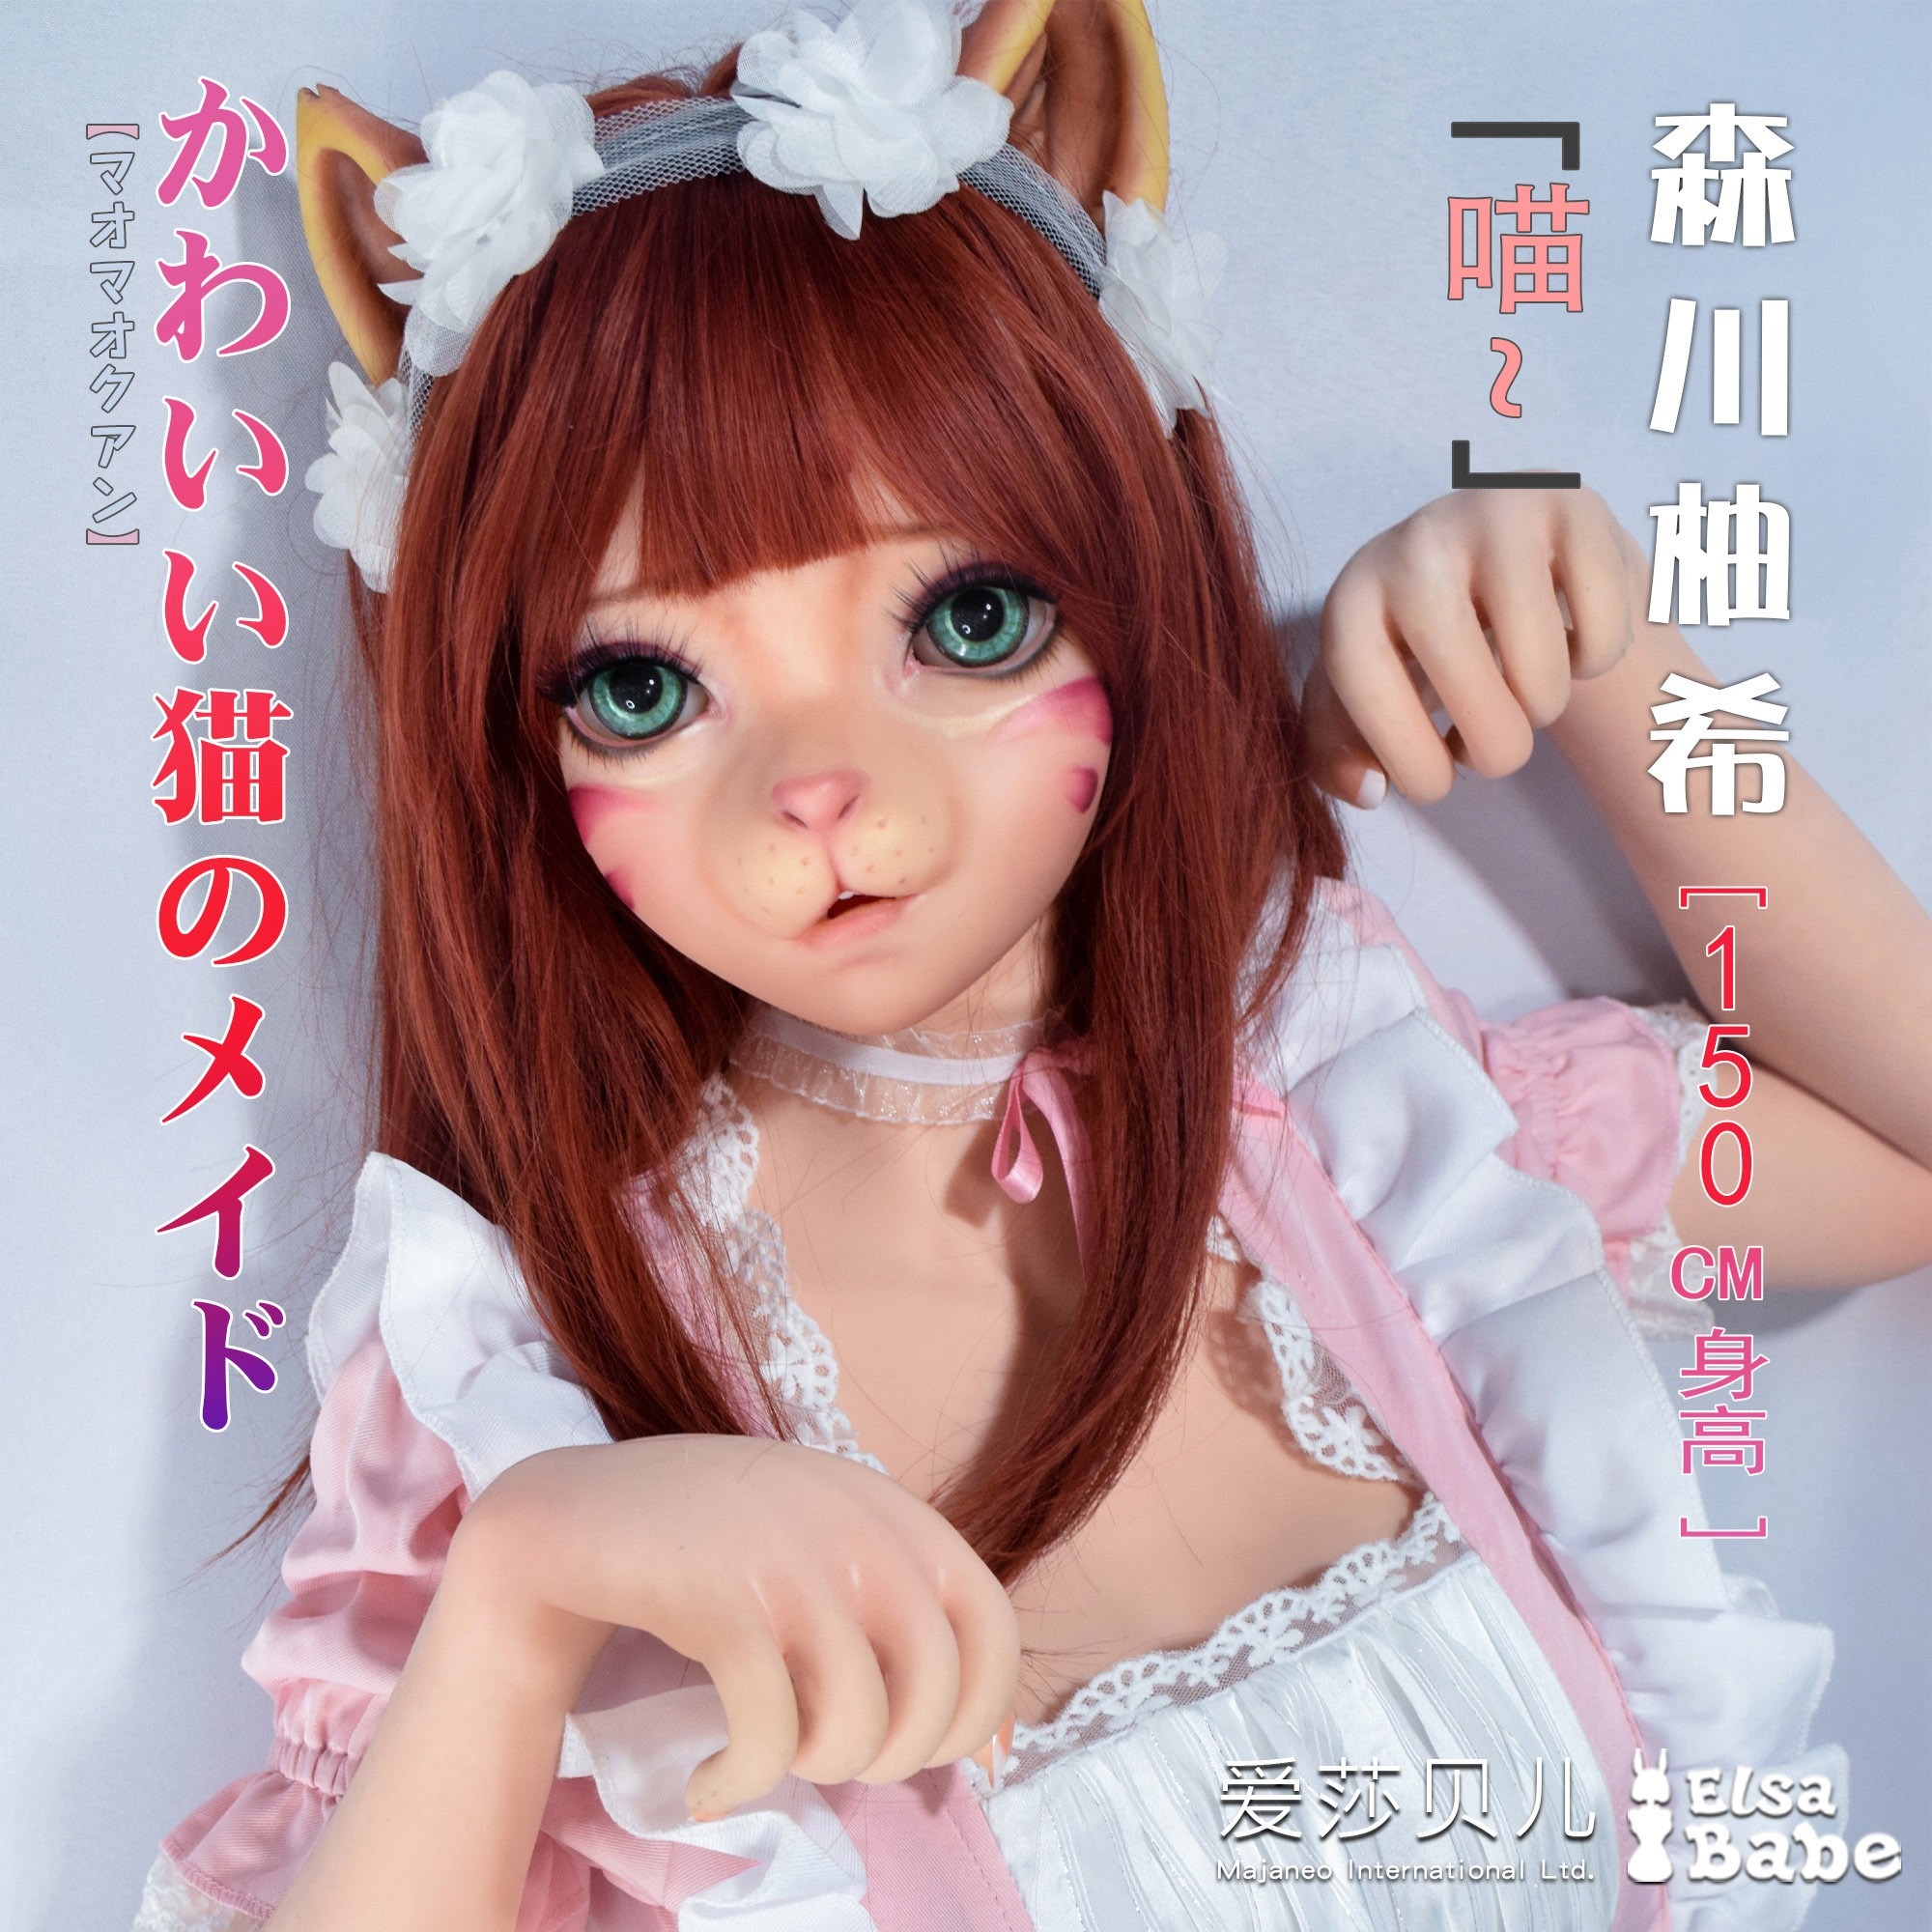 ElsaBabe 150cm Animorphic Platinum Silicone Sex Doll Anime Figure Body Real Solid Erotic Toy with Metal Skeleton, Morikawa Yuki